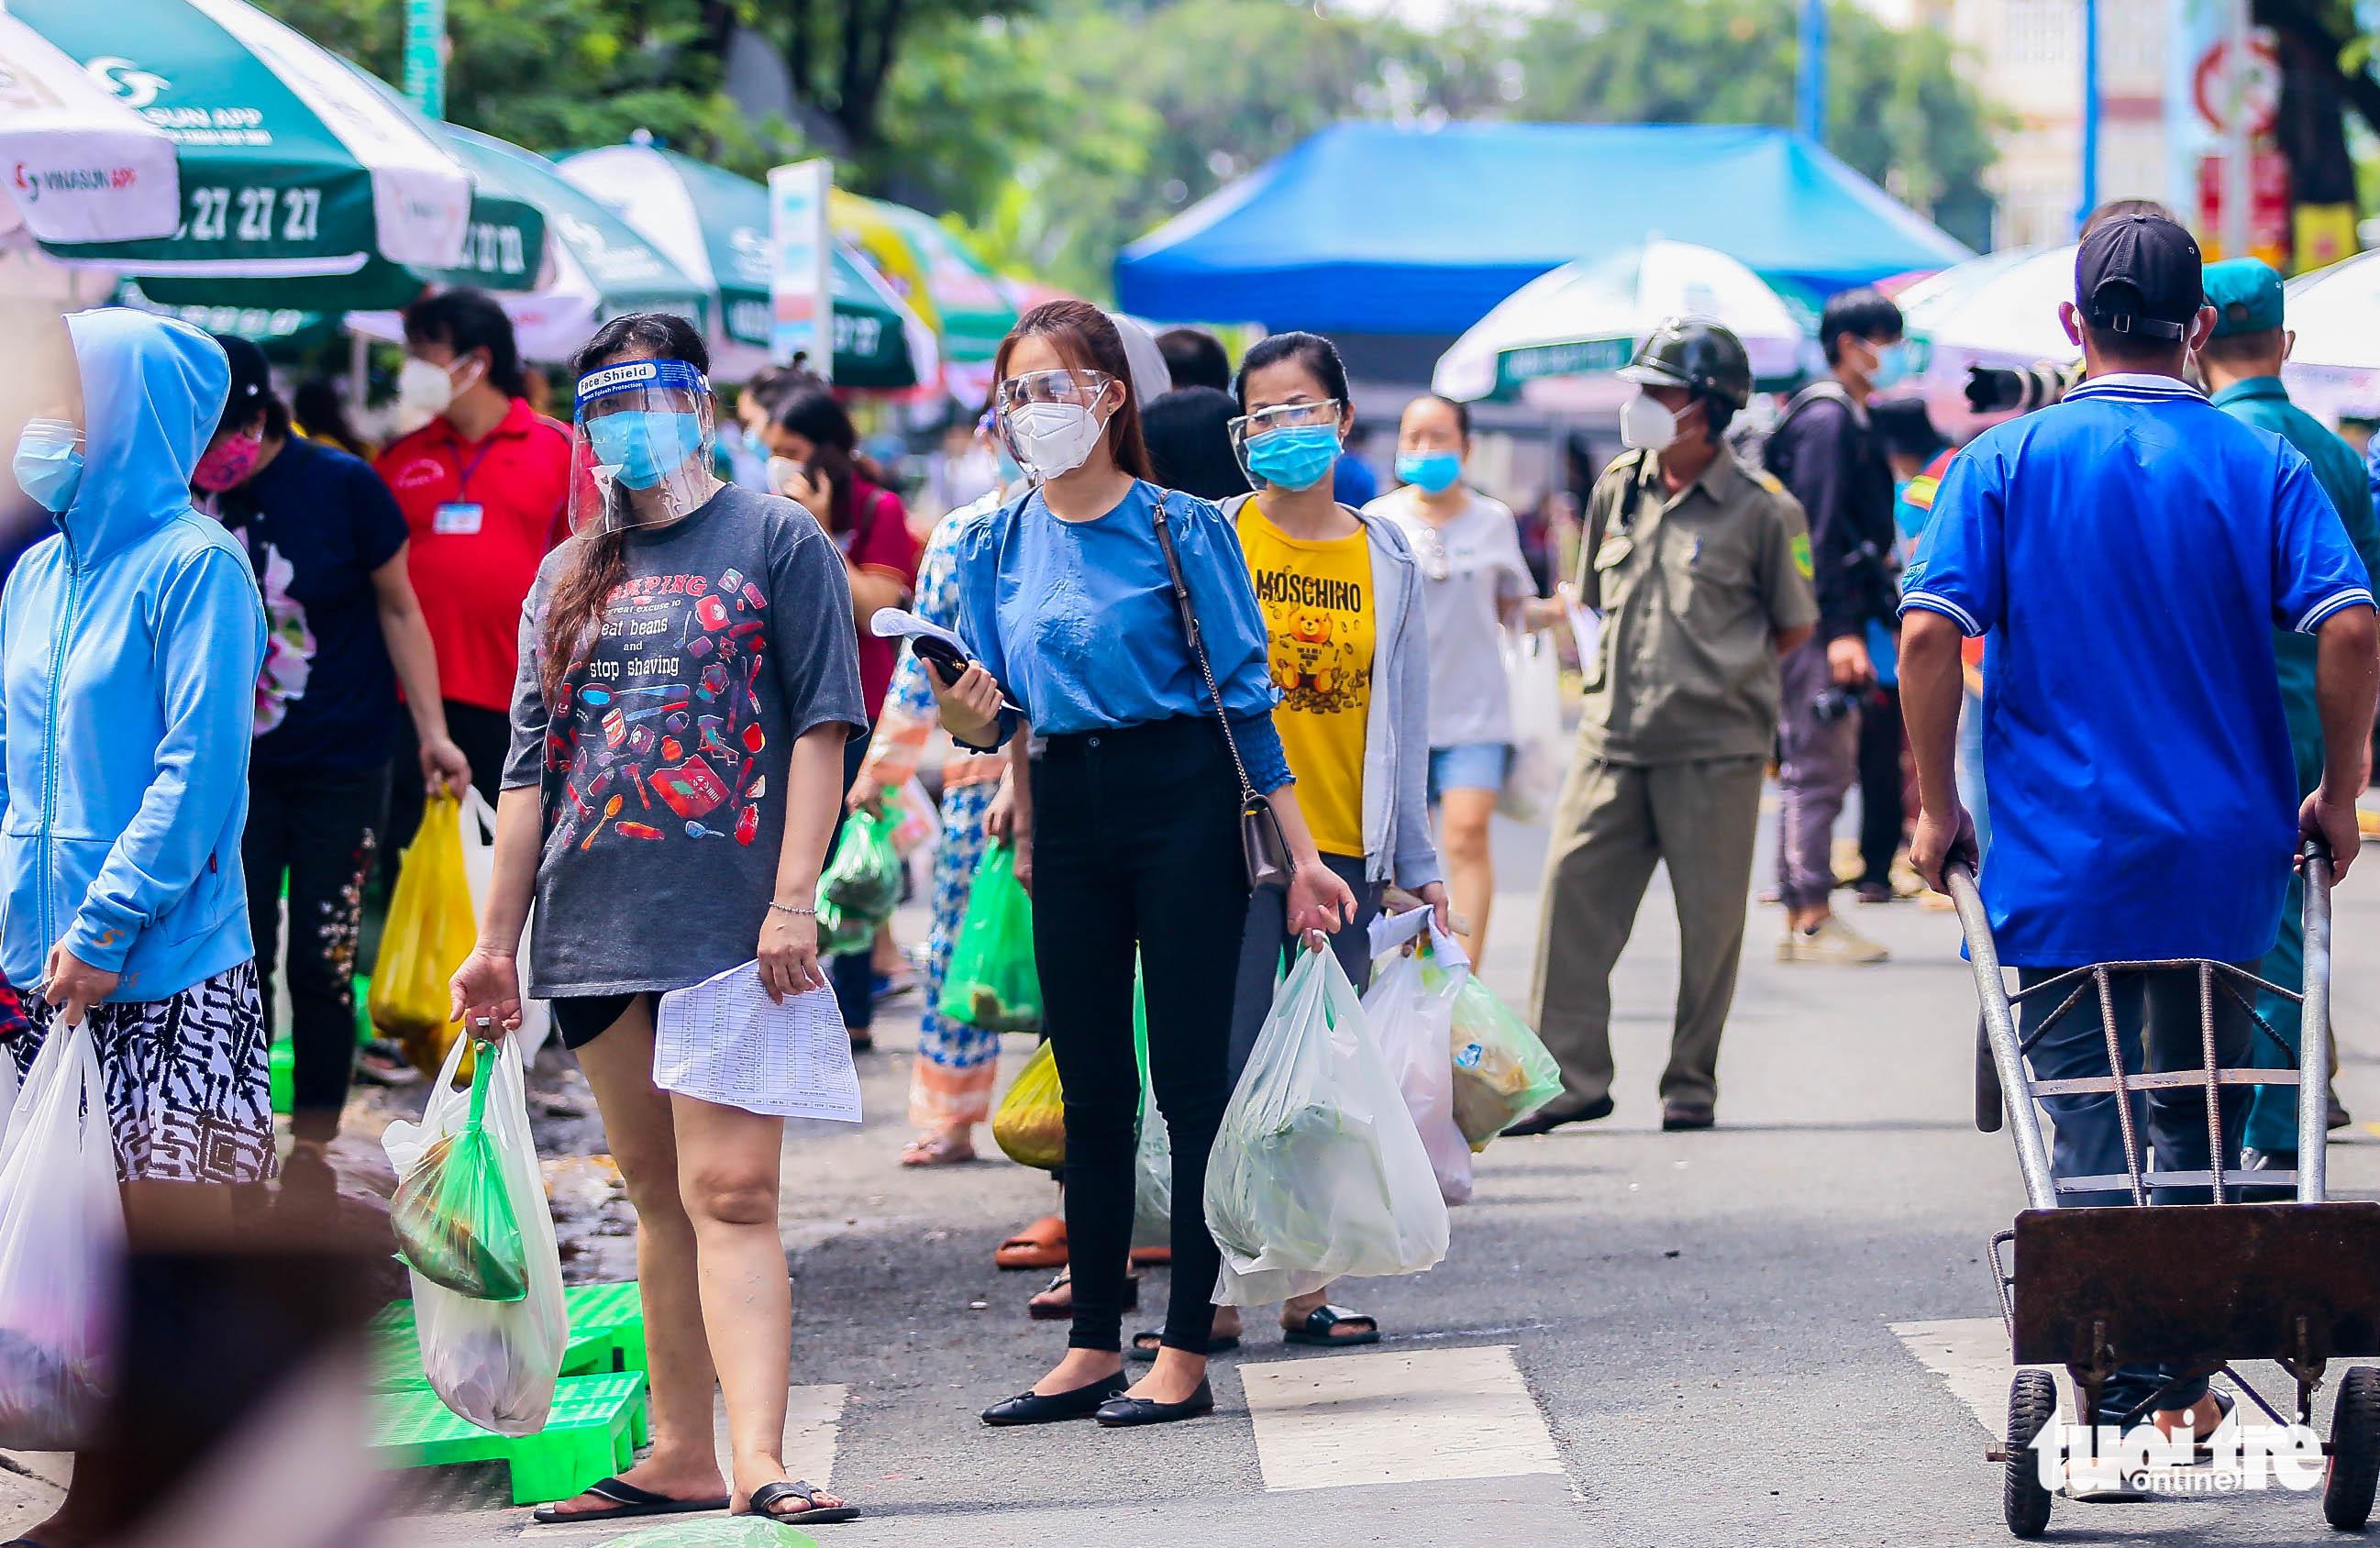 Residents enjoy shopping at makeshift market in Ho Chi Minh City